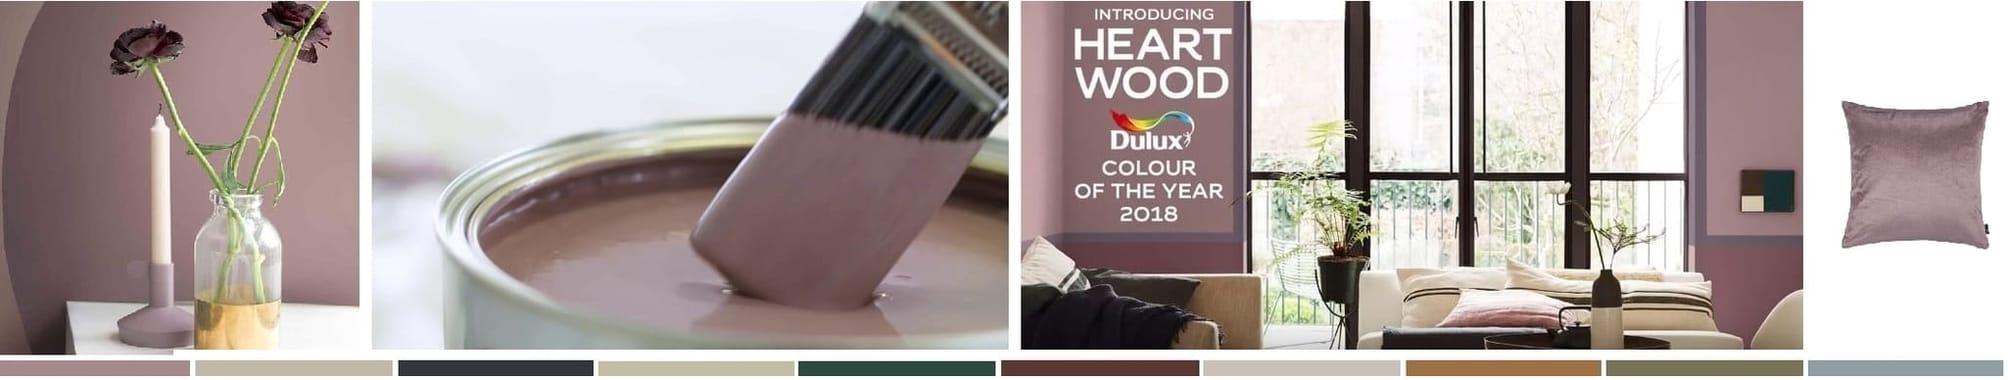 <a href='http://www.saragoudas.gr/ell/categories/Heart-Wood-Dulux-einai-to-xroma-tis-xronias-2018'>Heart Wood Δείτε το Χρώμα της Χρονιάς 2018 μέσα από Εικόνες</a>